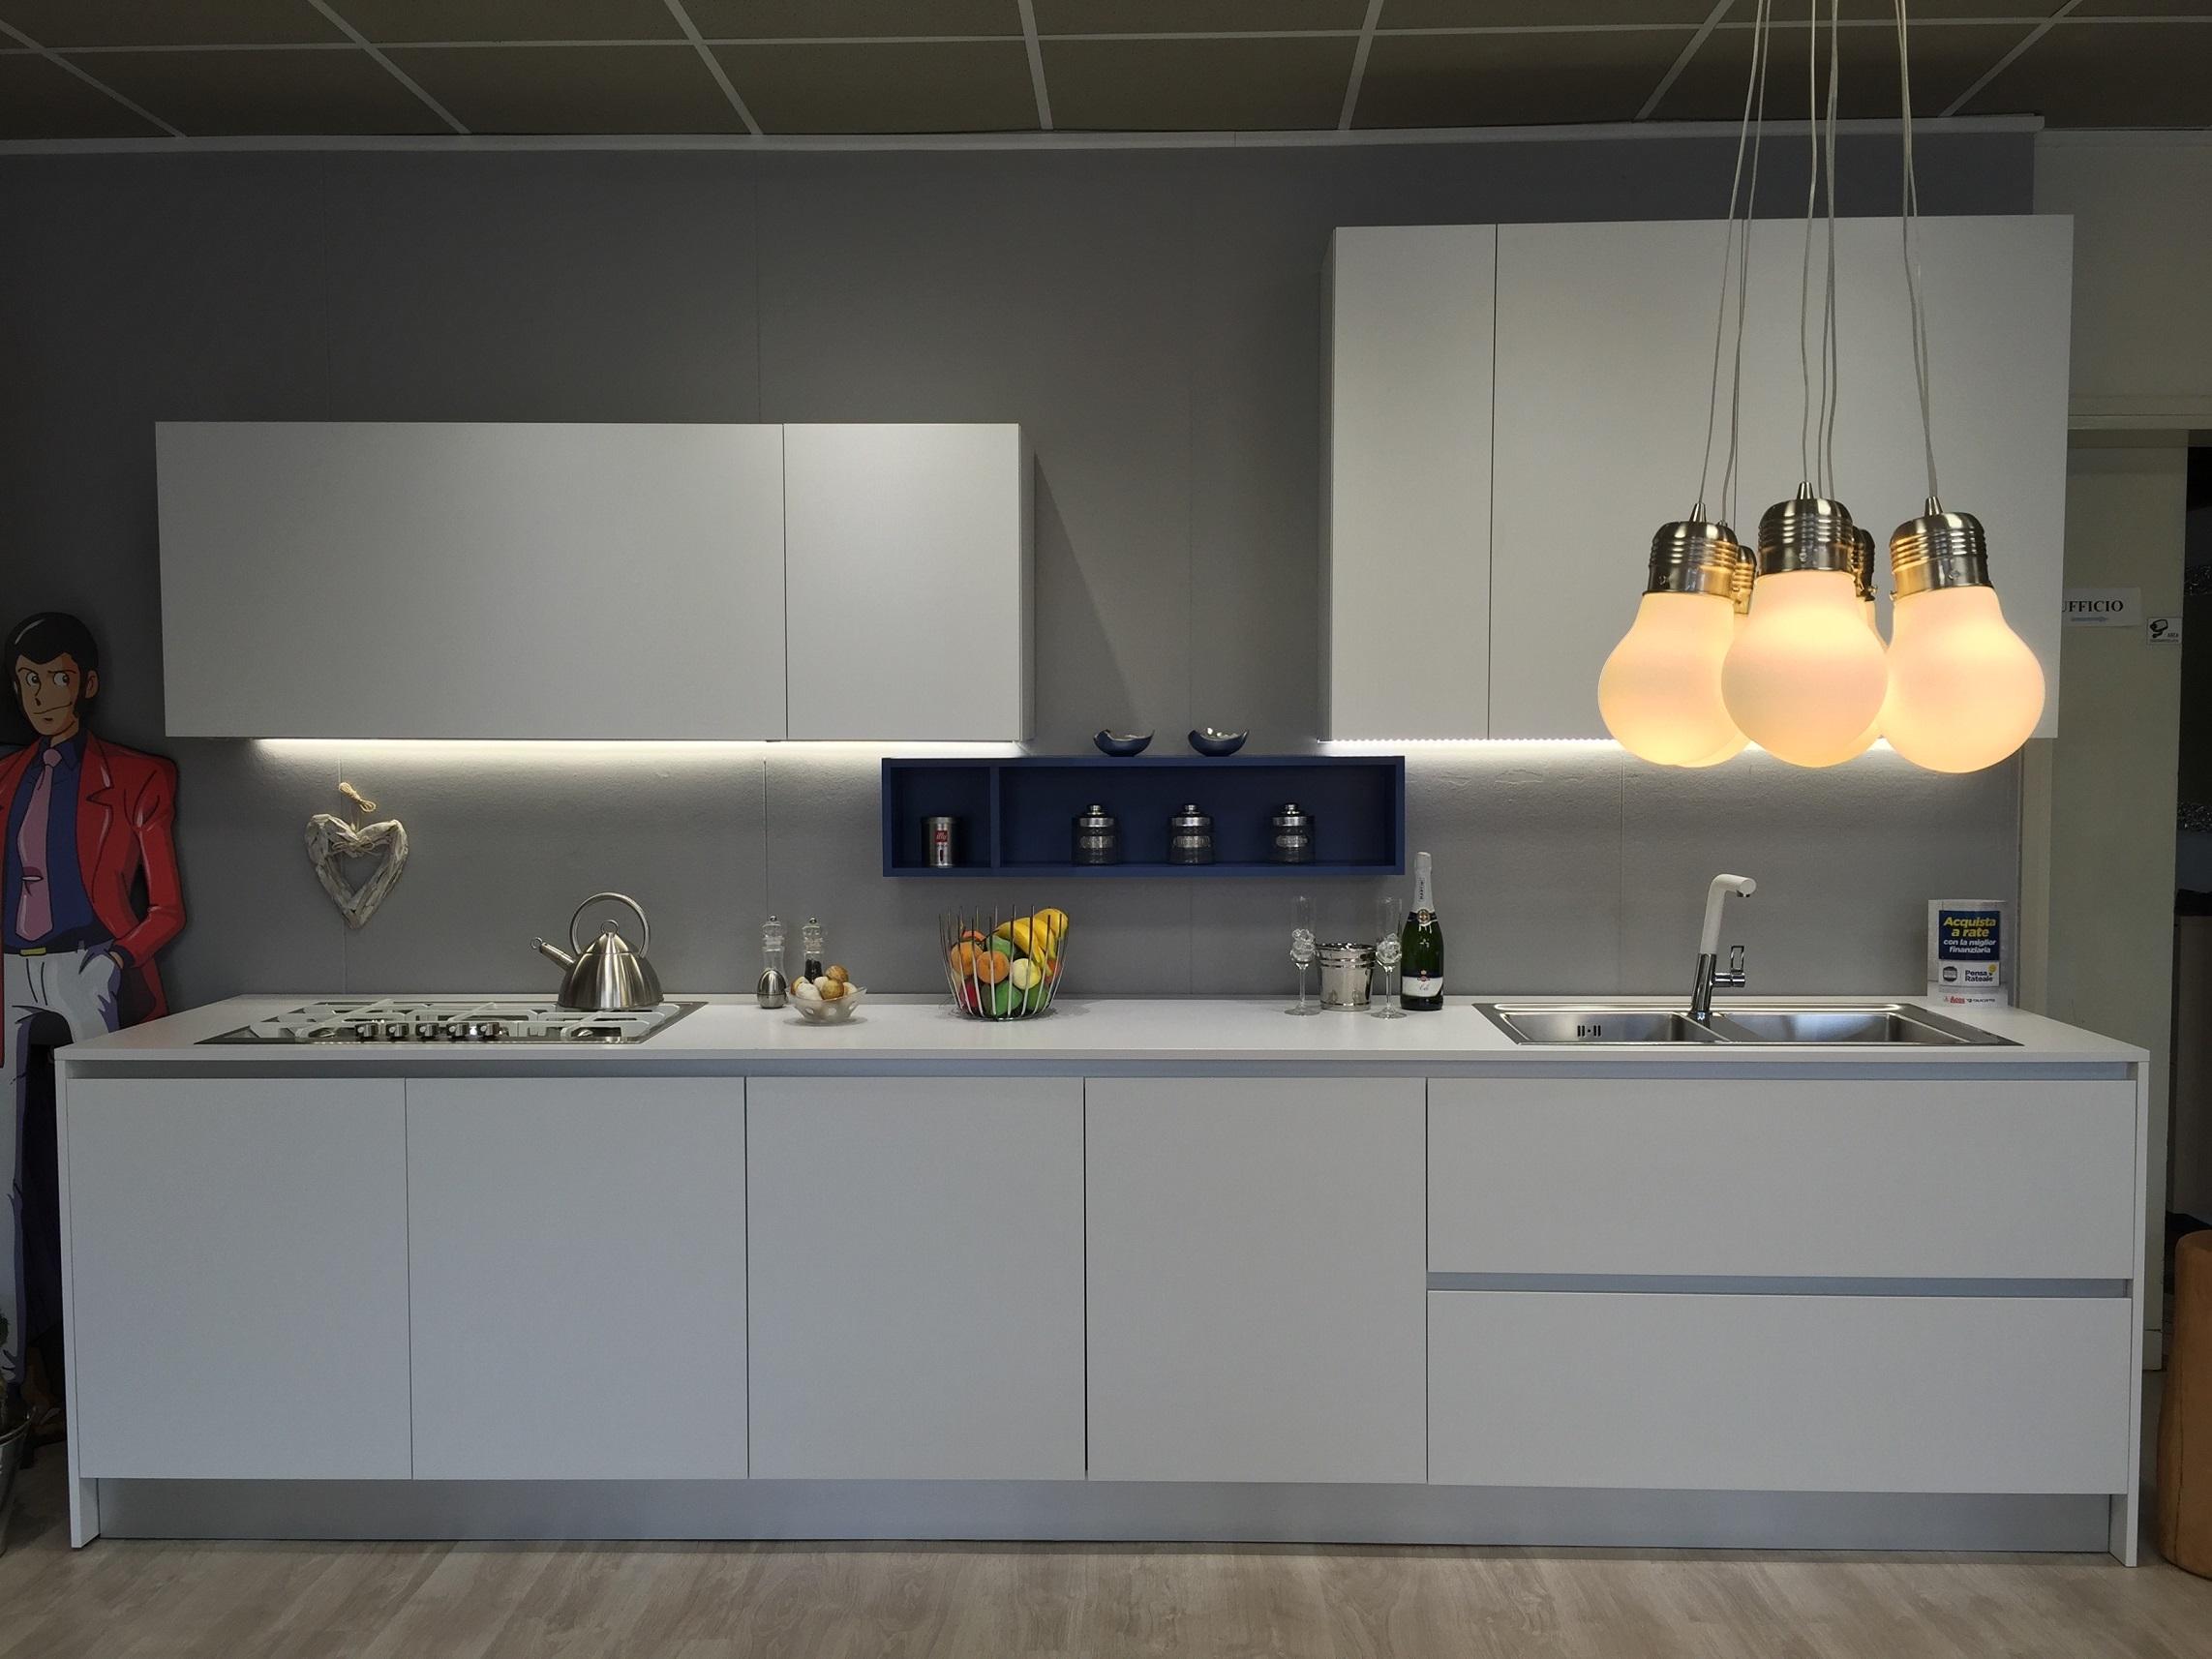 Stunning Doimo Cucine Spa Gallery - Ideas & Design 2017 ...